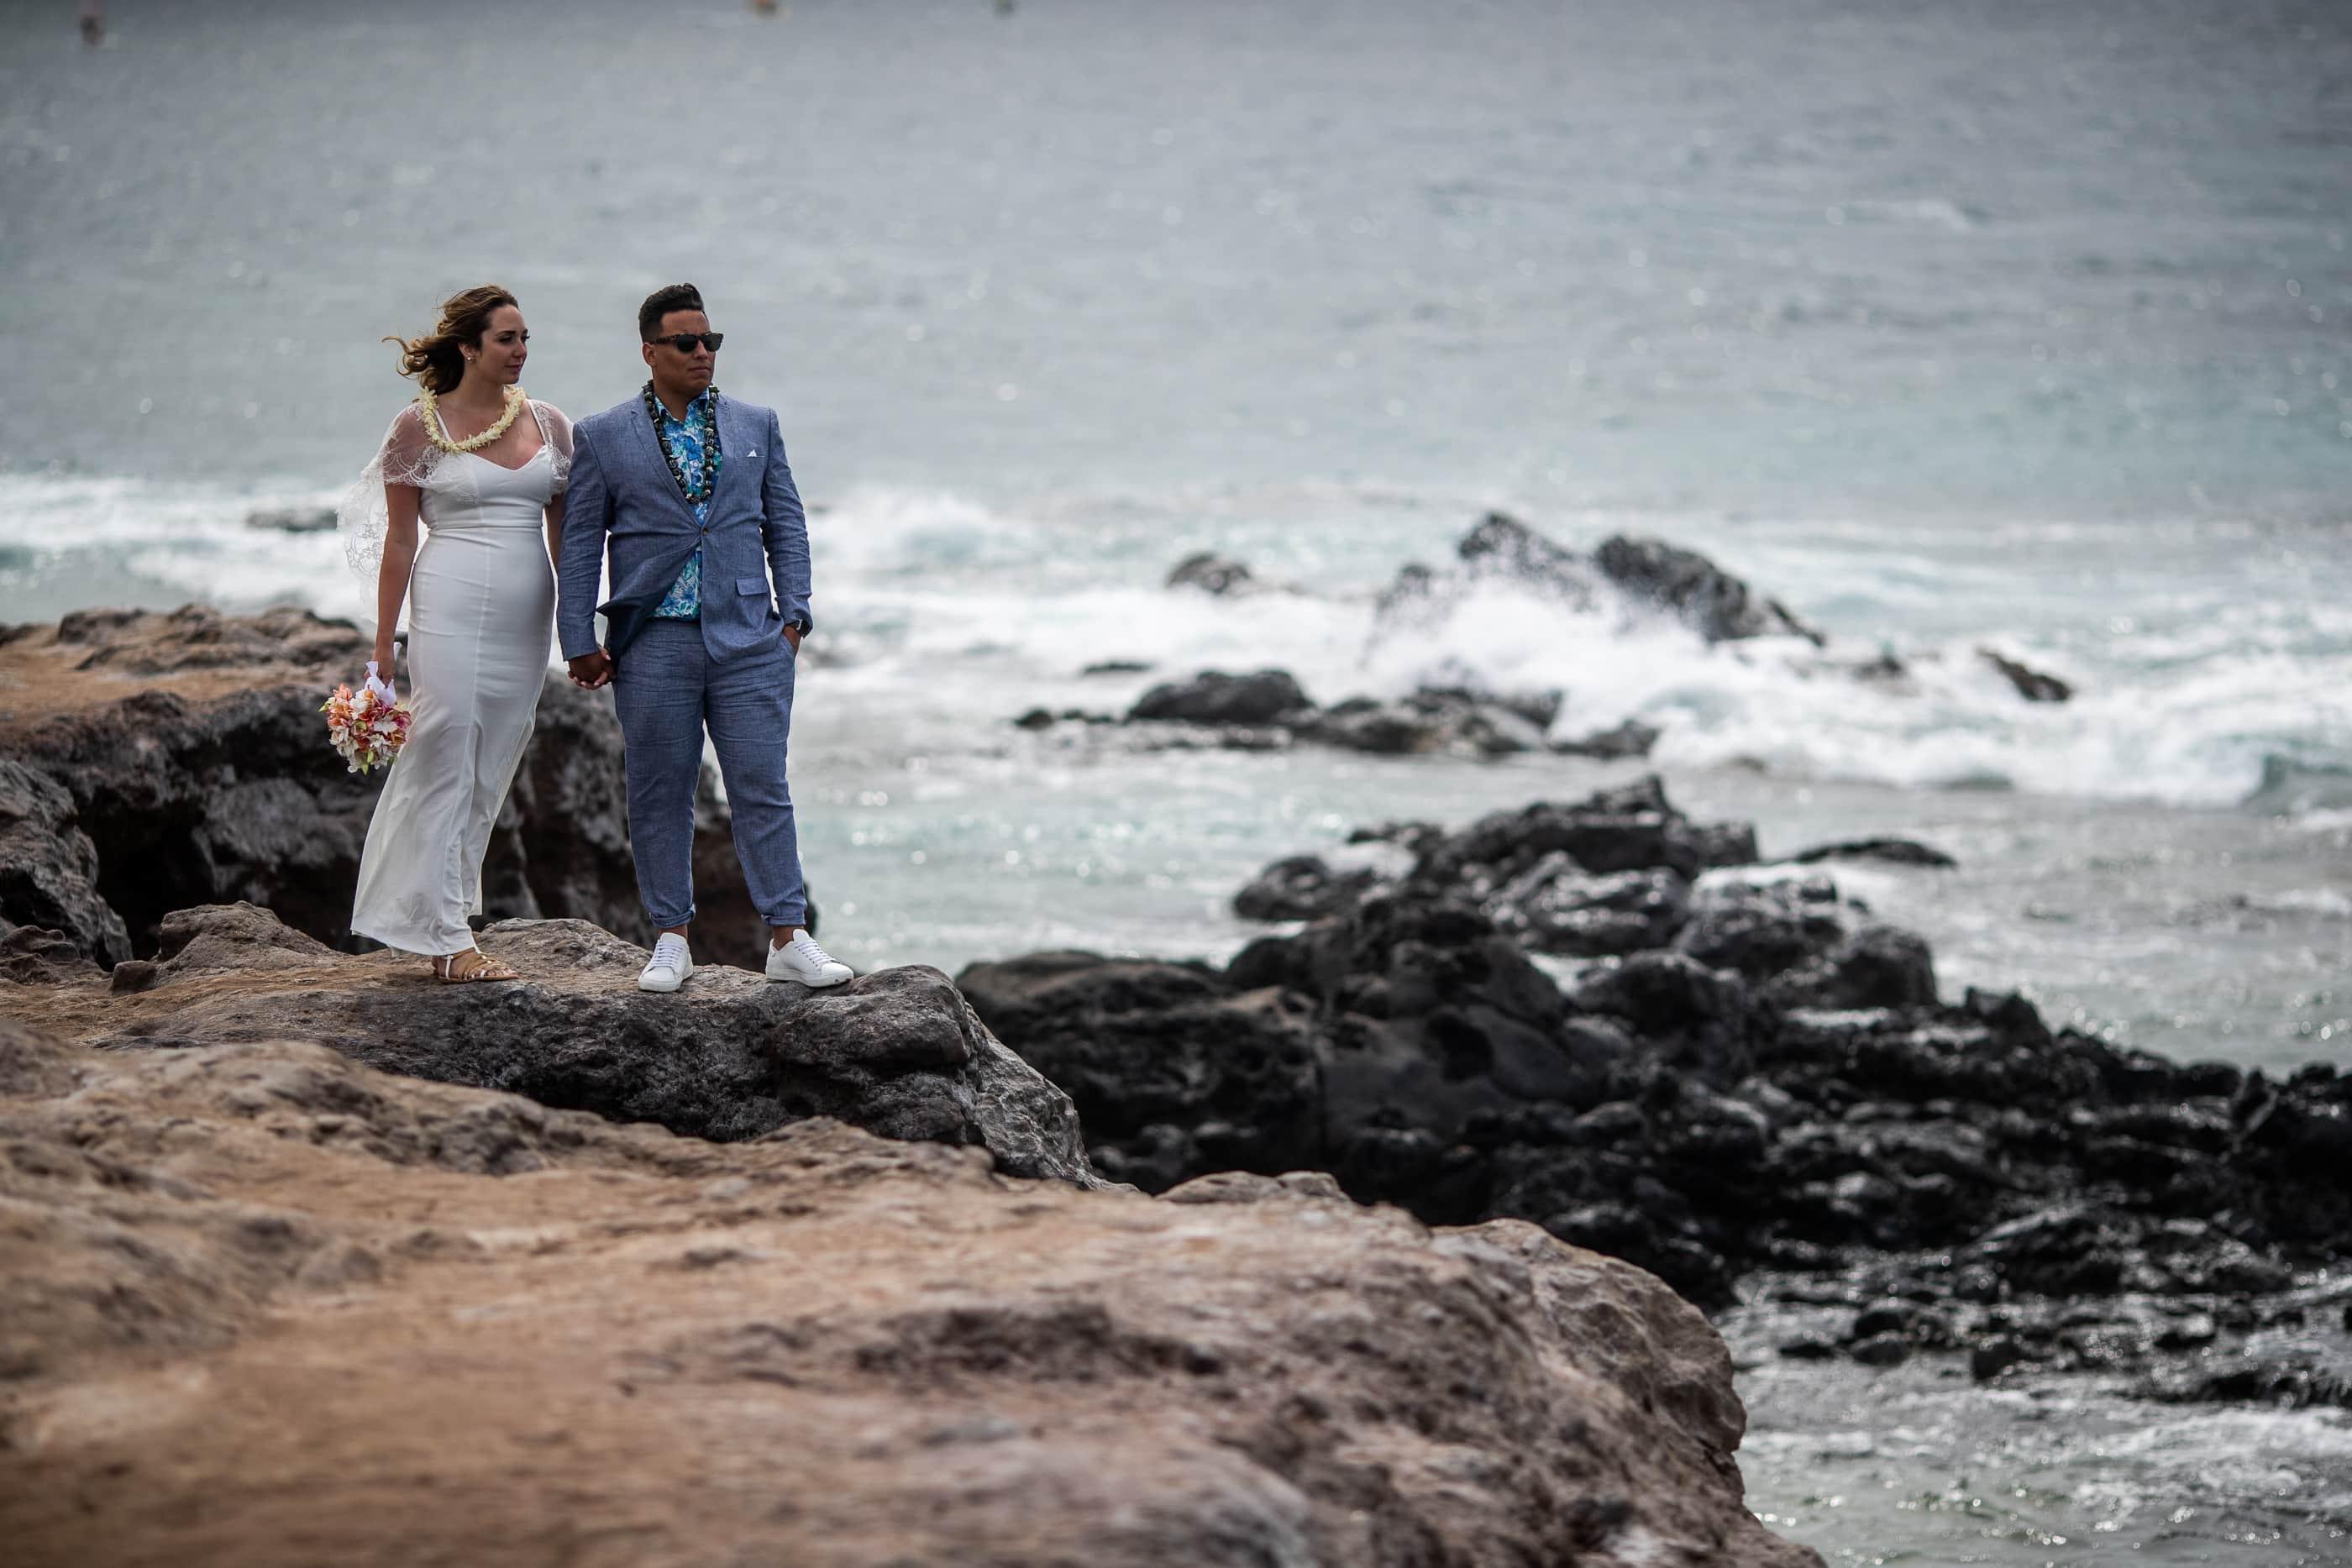 Planning a Destination Wedding in Hawaii